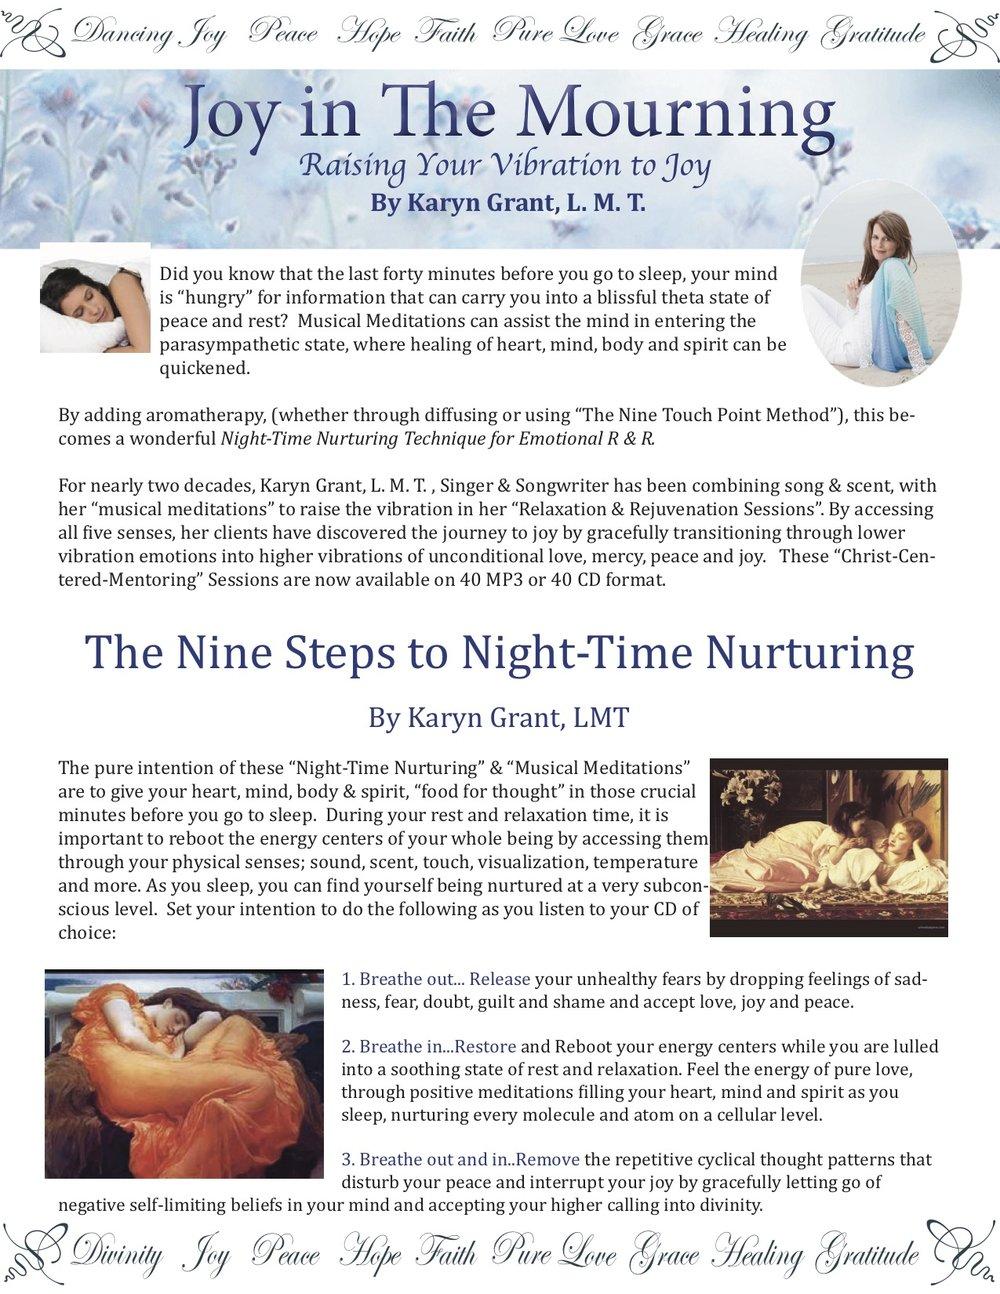 Nine Steps to Night-Time-Nurturing GIft  .jpg